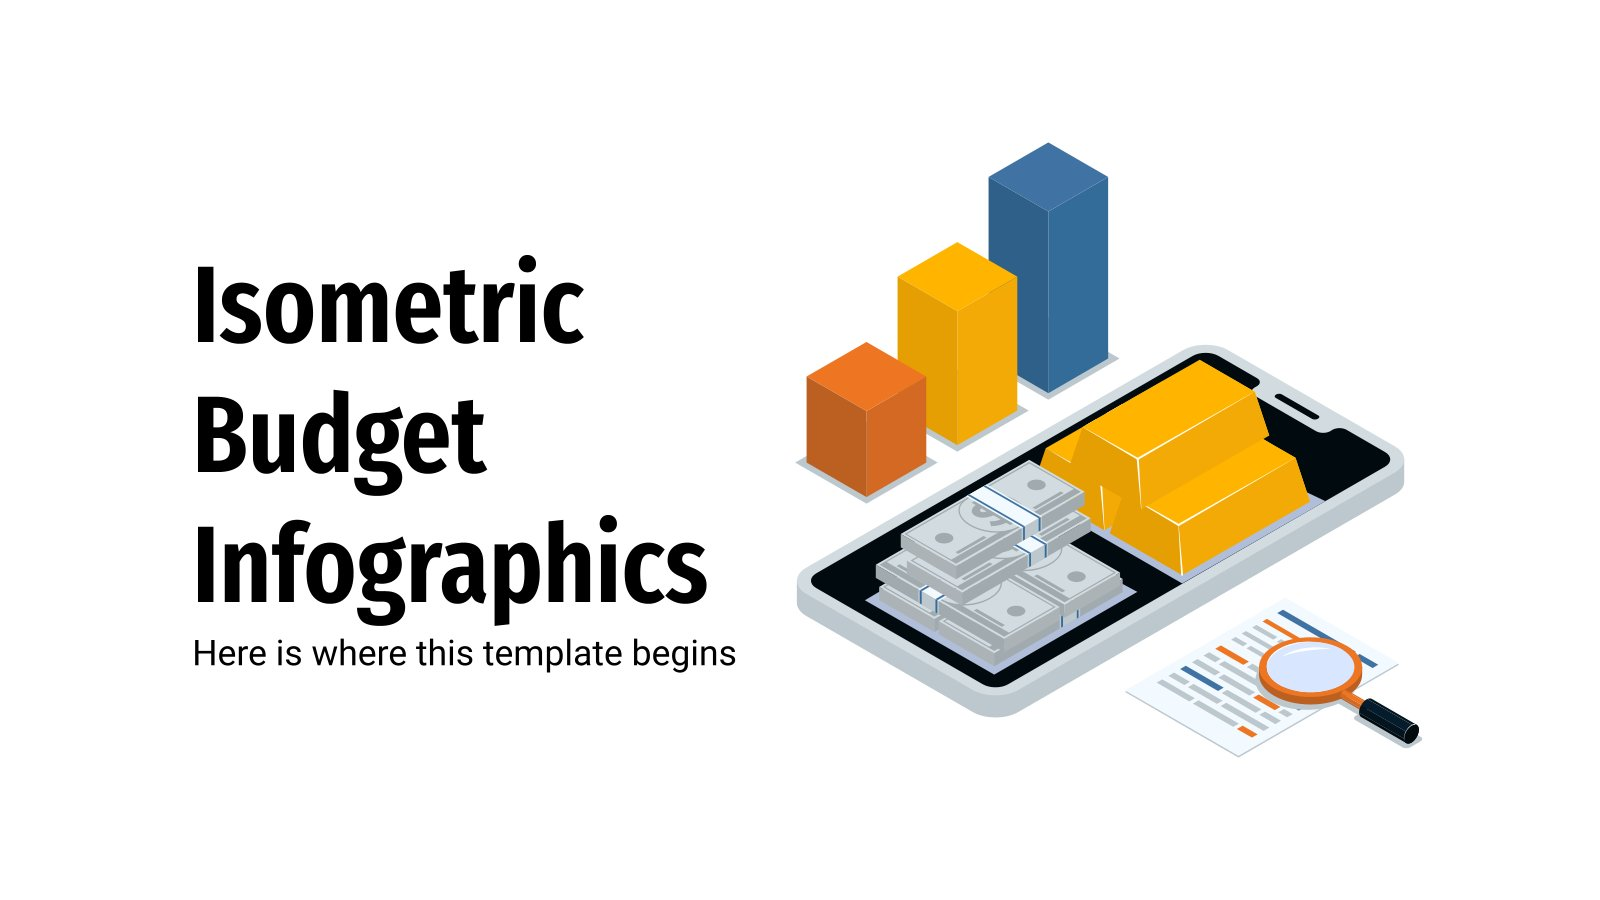 Isometric Budget Infographics presentation template